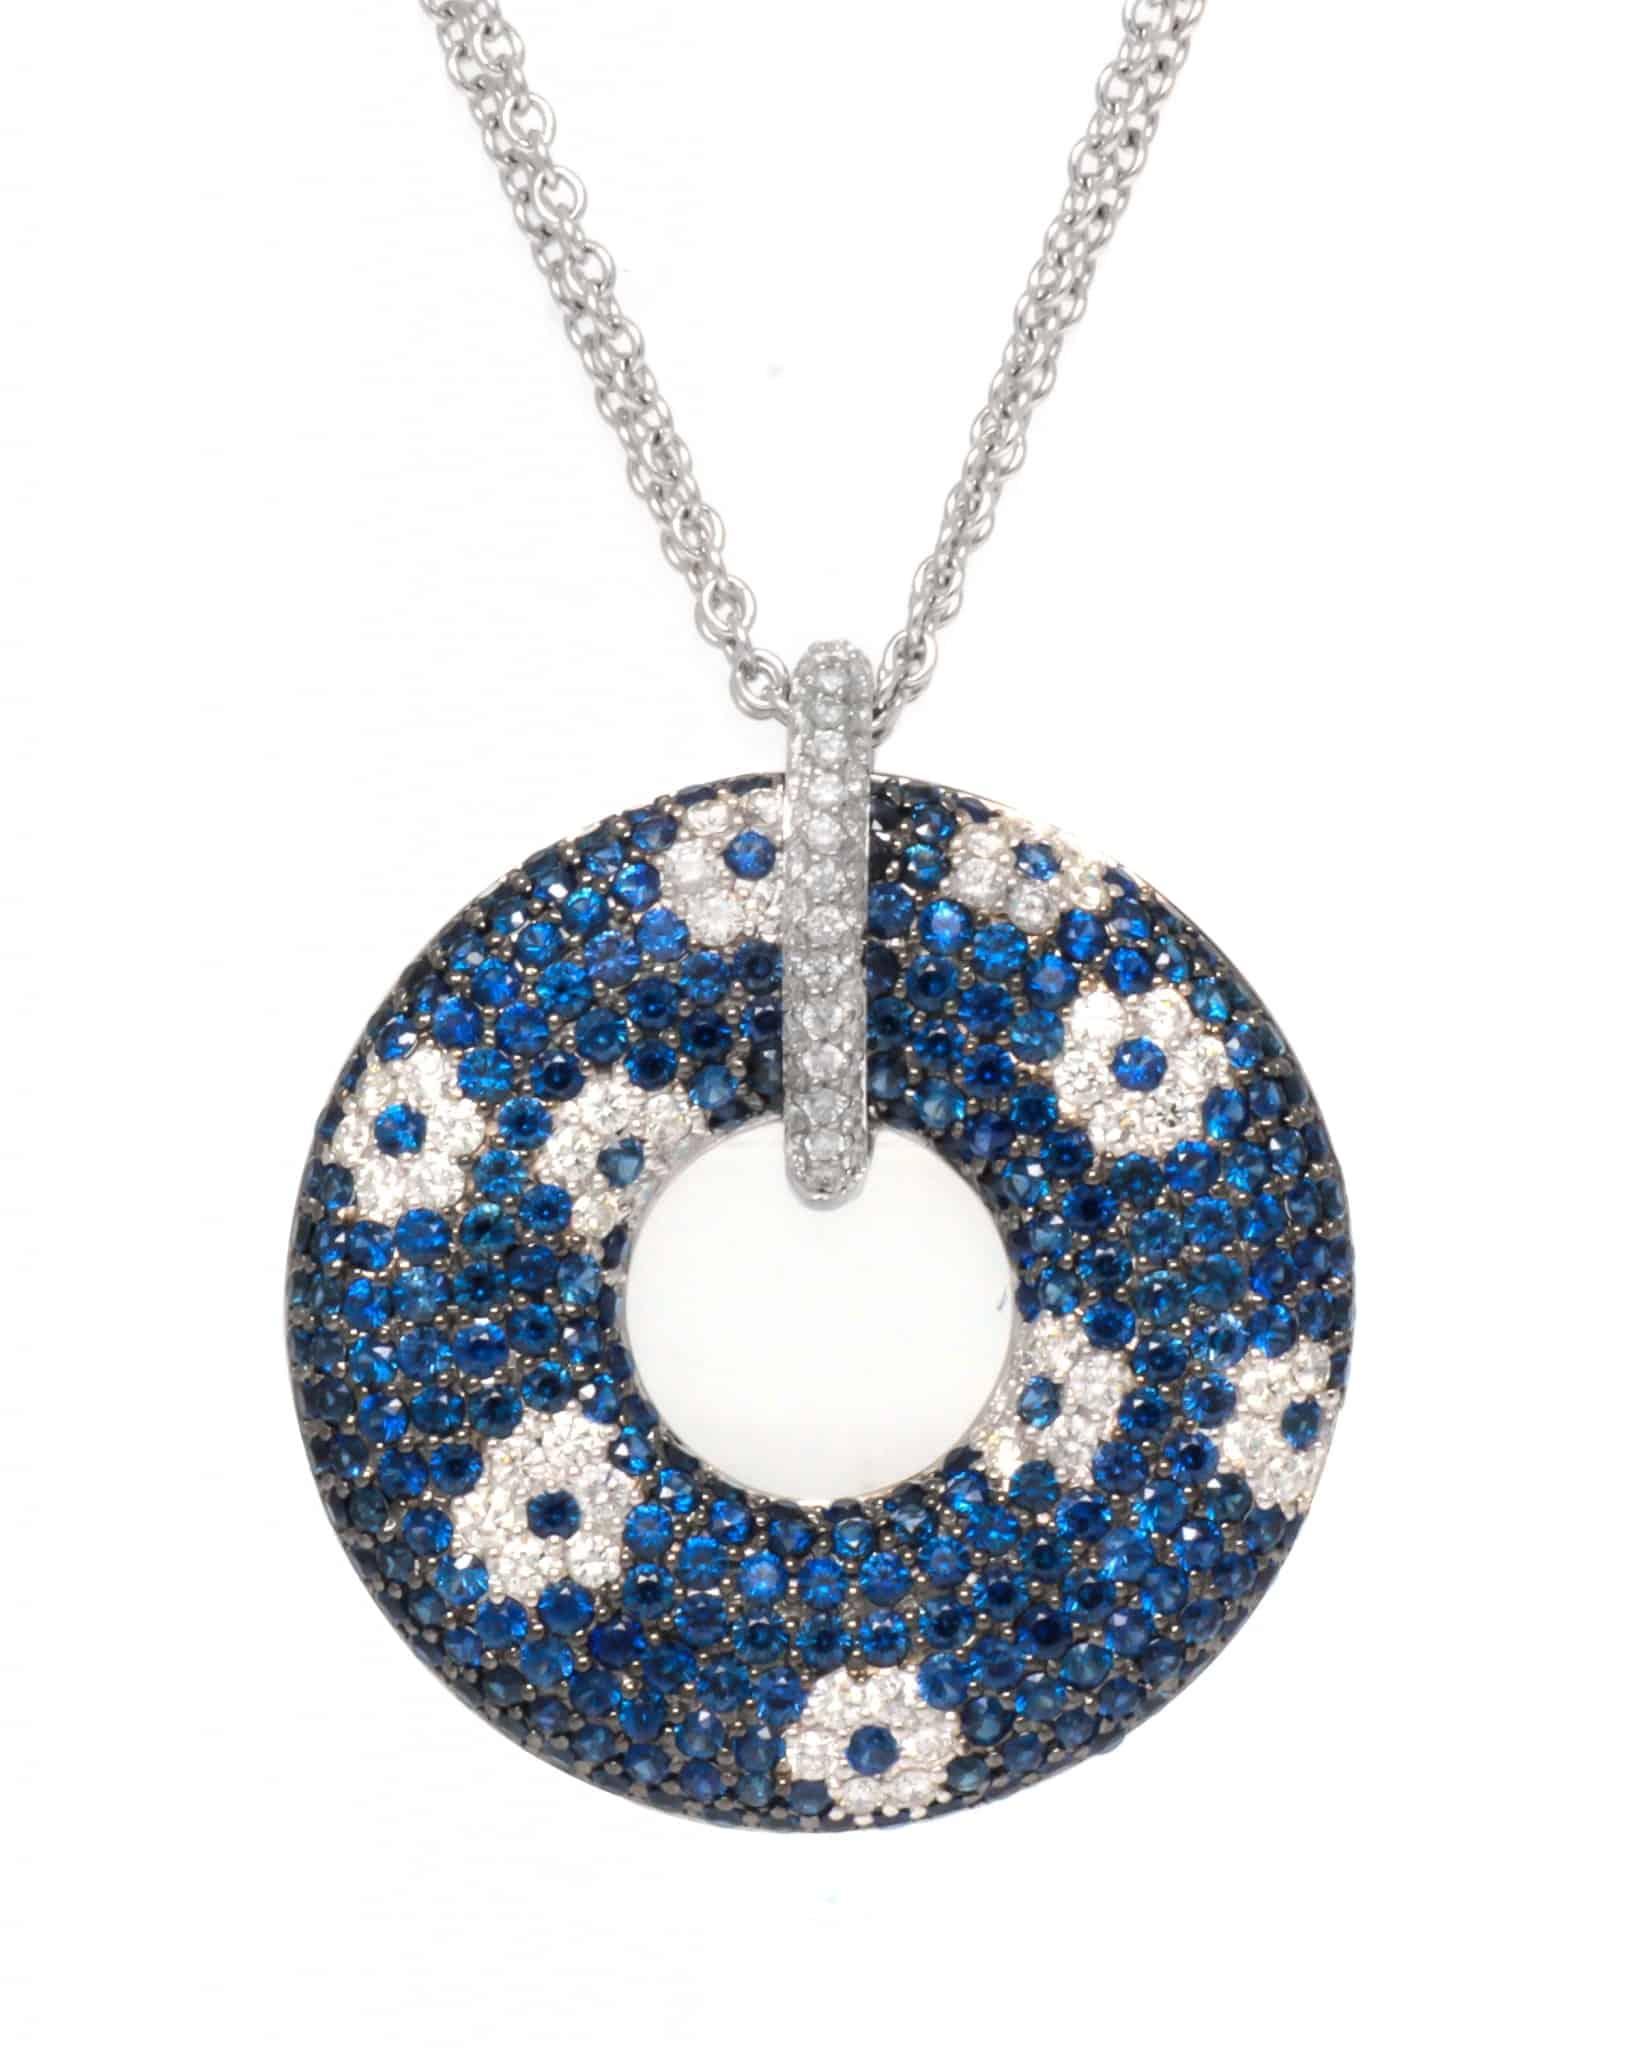 ROBERTO COIN 18K White Gold B Sap Diamond Flower Necklace 888094AWCHDS